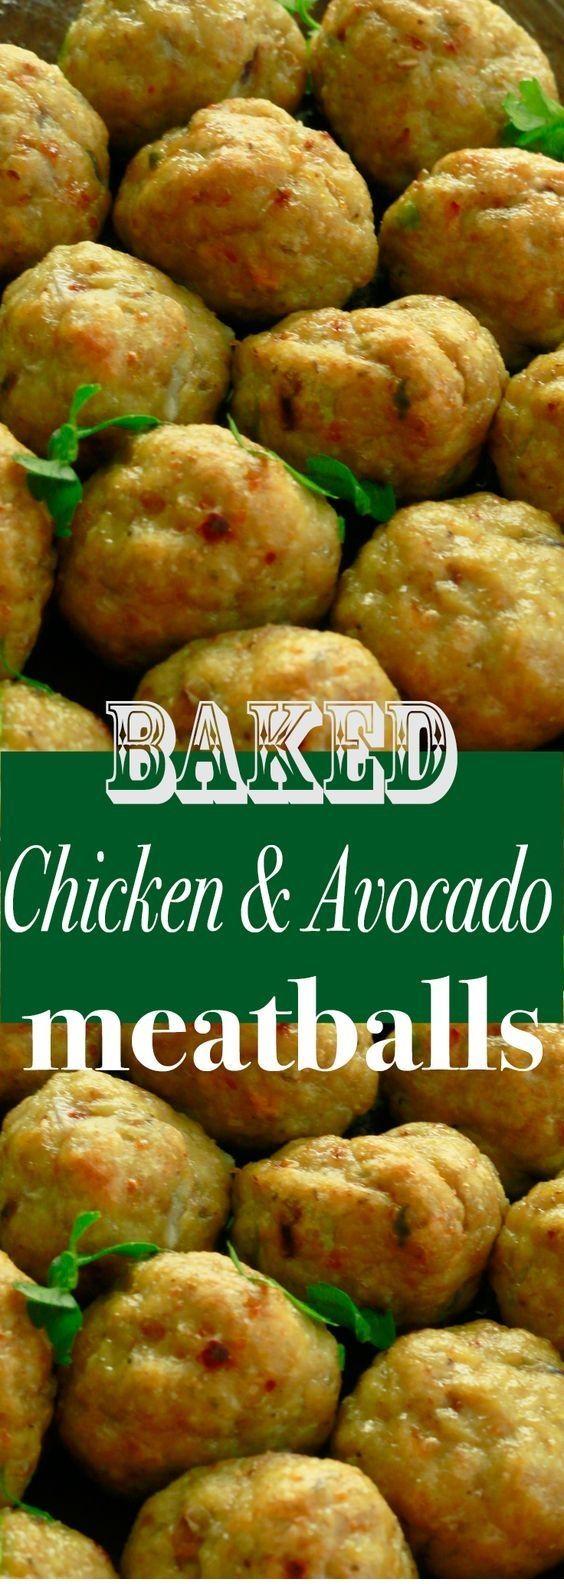 Healthy Avocado Recipes | Baked Chicken Avocado Meatballs - Healthy Avocado Recipes -